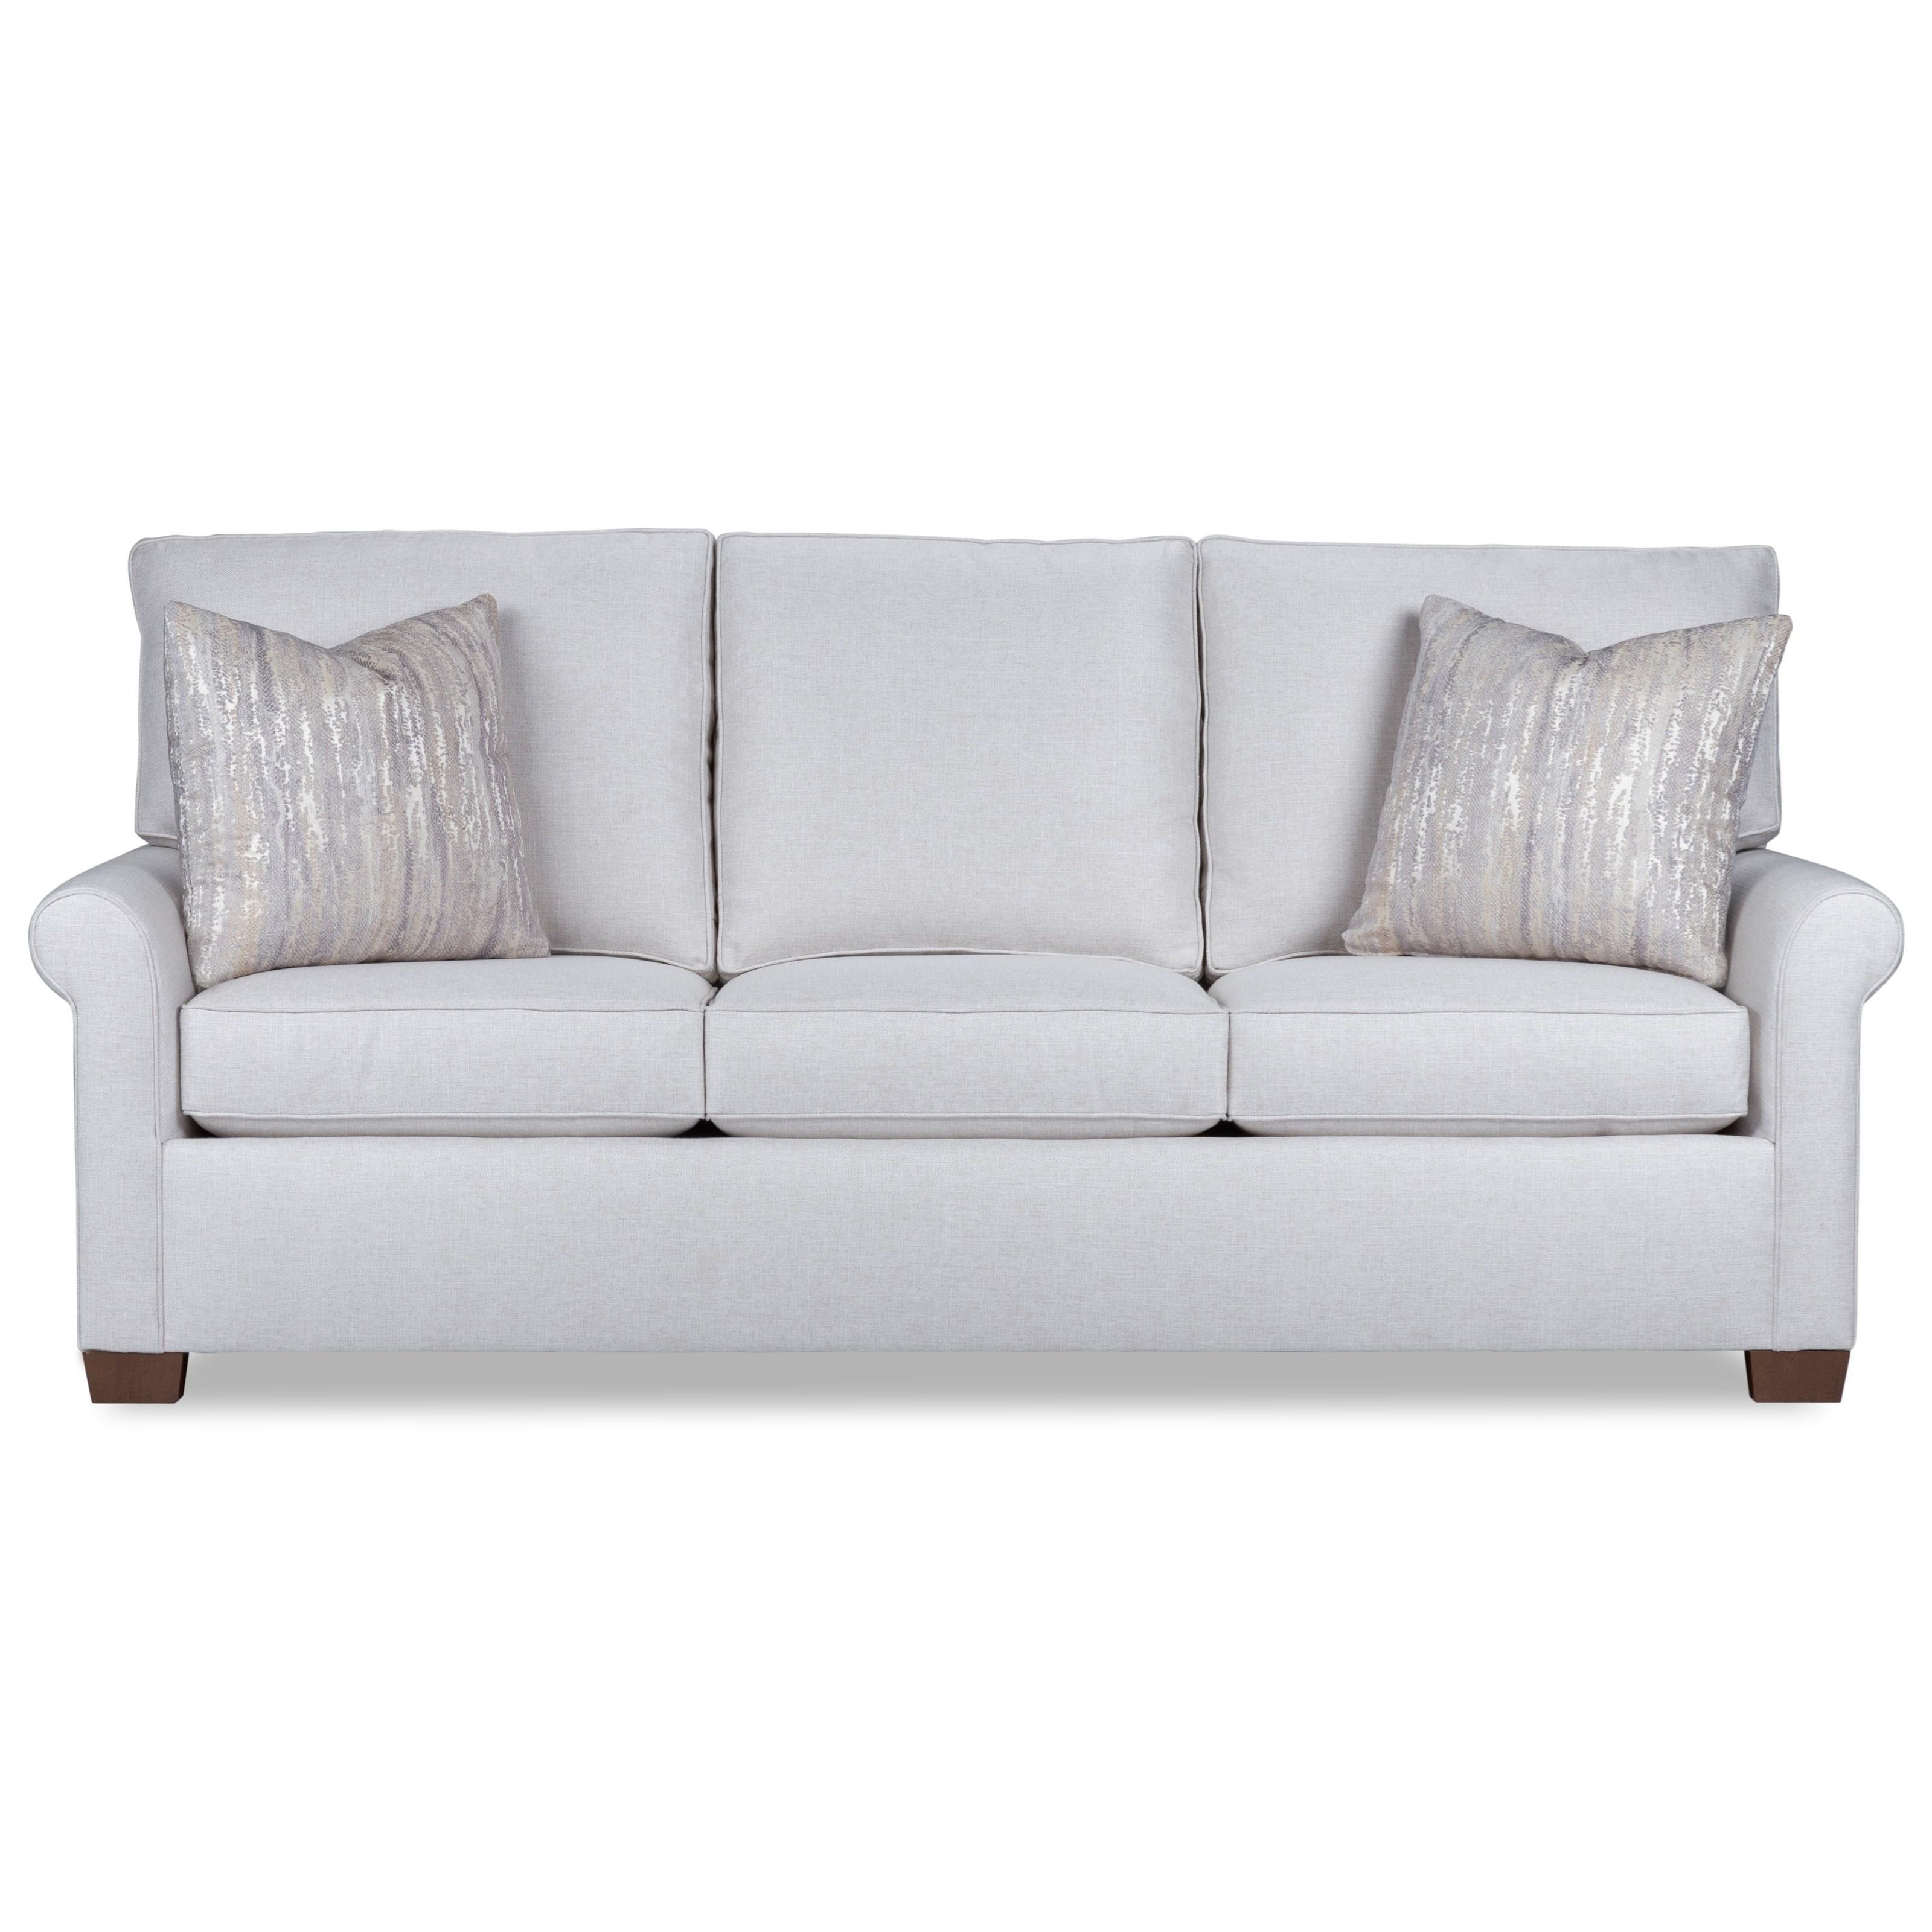 2800 Customizable Sofa by Geoffrey Alexander at Sprintz Furniture